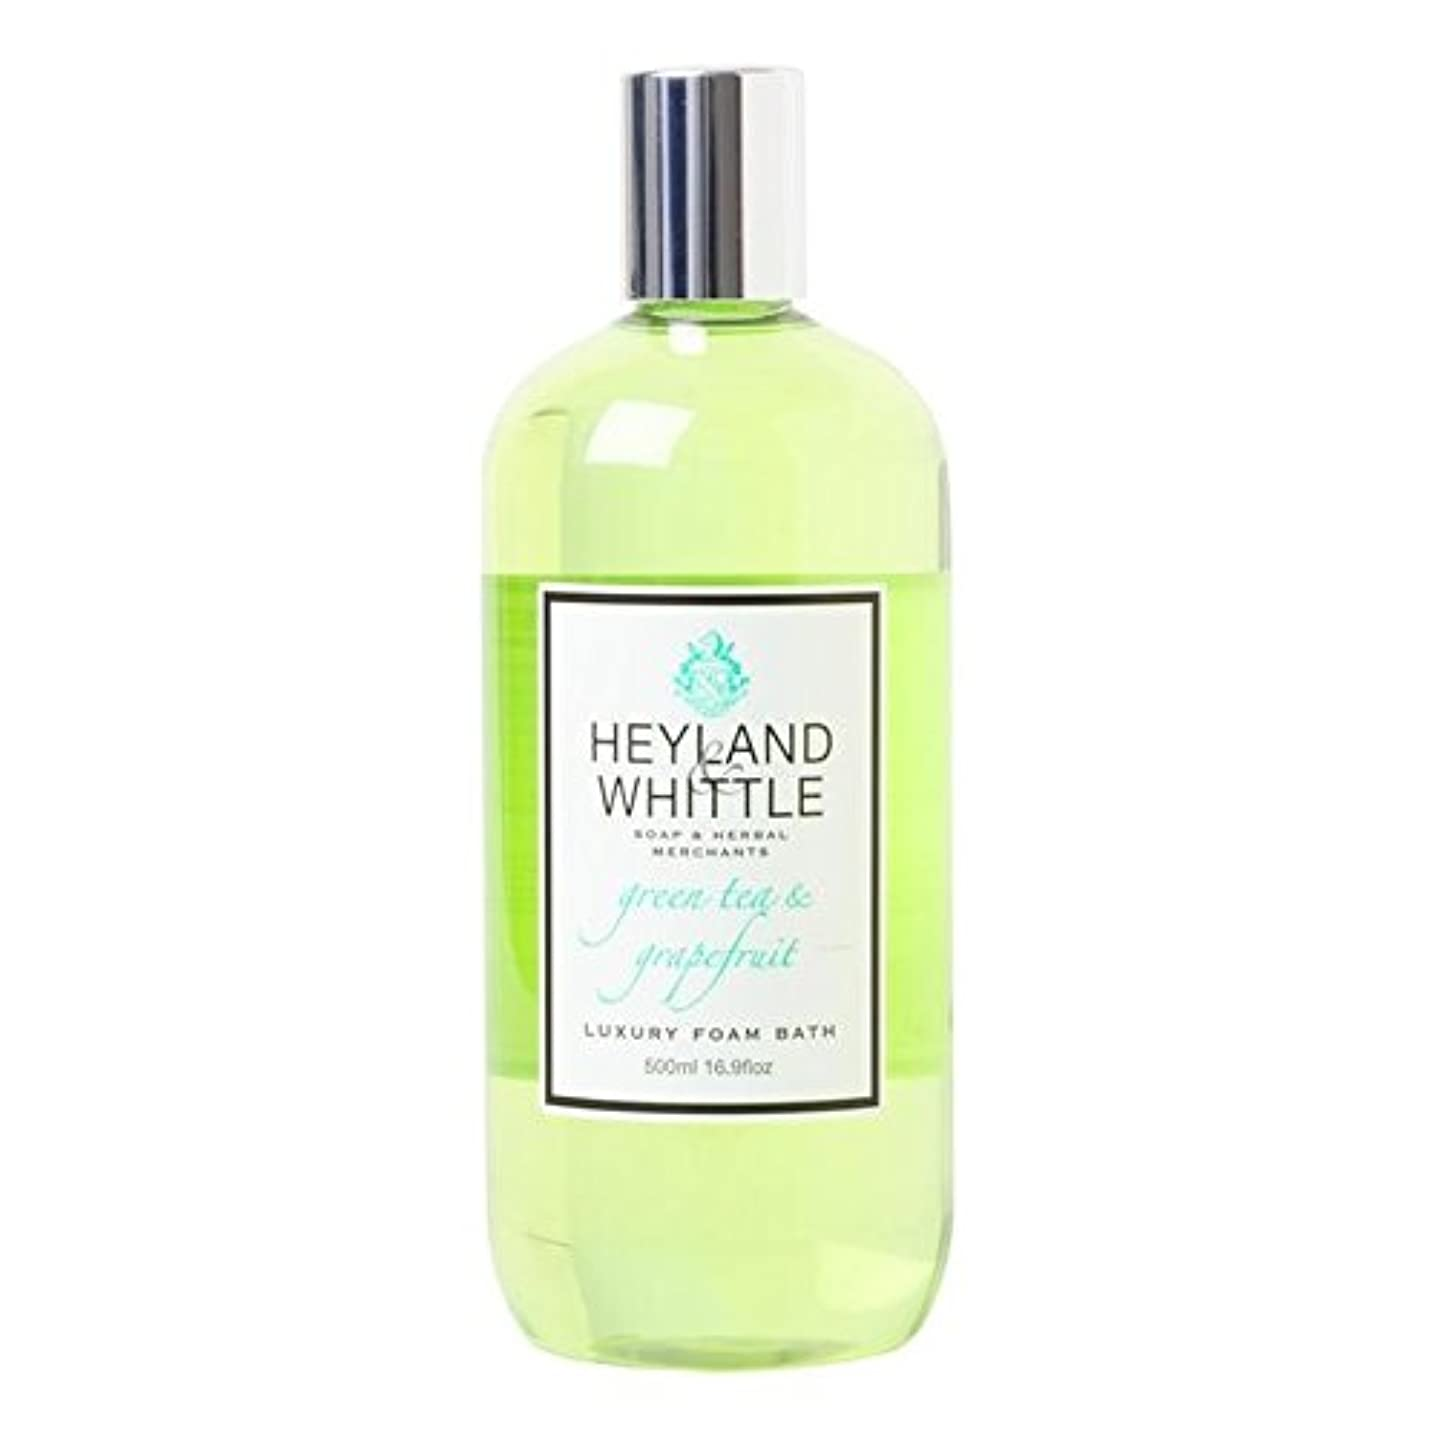 Heyland & Whittle Greentea & Grapefruit Foam Bath 500ml (Pack of 6) - &削るグリーンティ&グレープフルーツ泡風呂500ミリリットル x6 [並行輸入品]